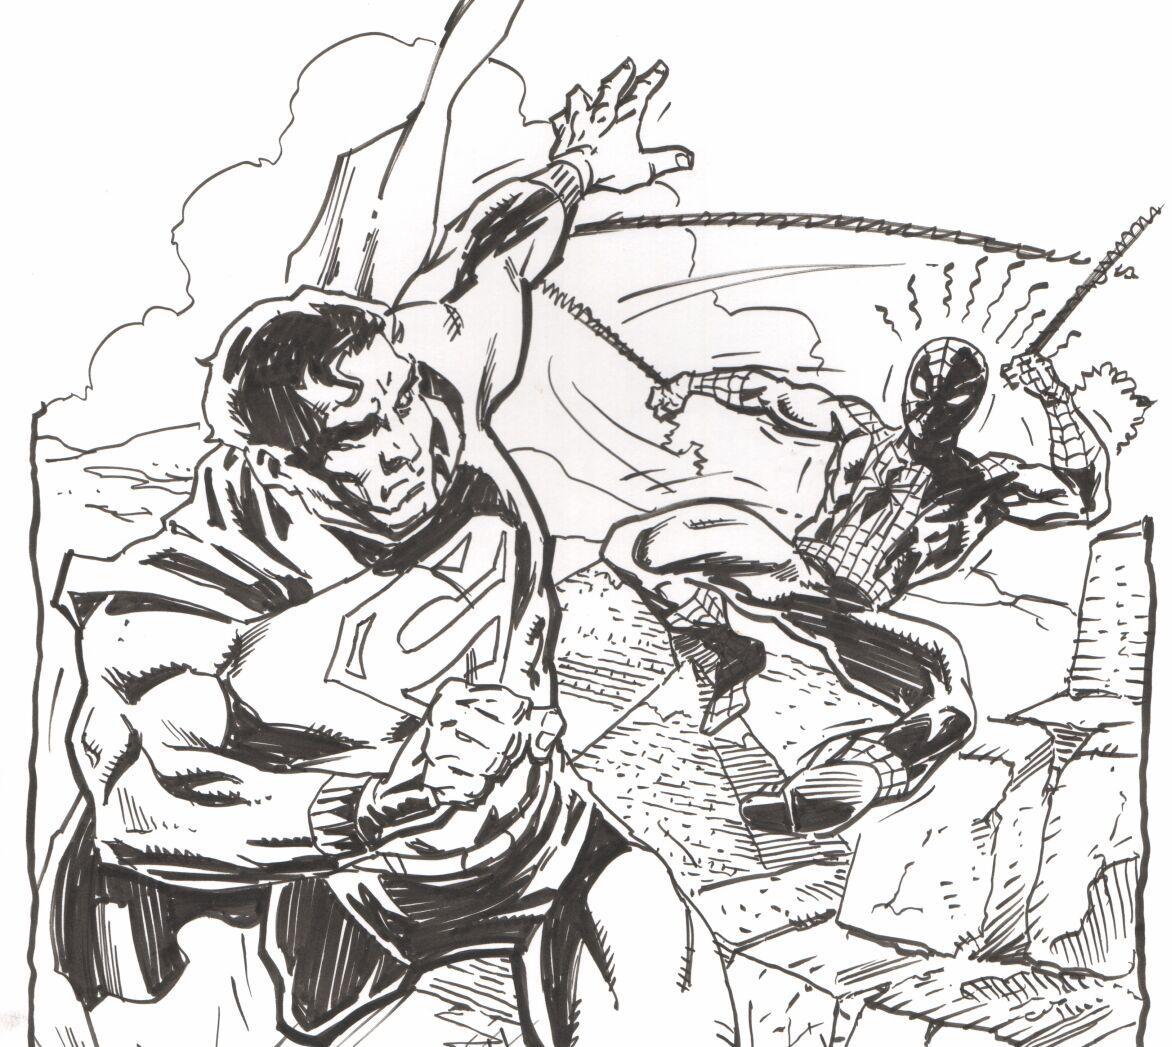 McDonnell Spiderman vs. Superman